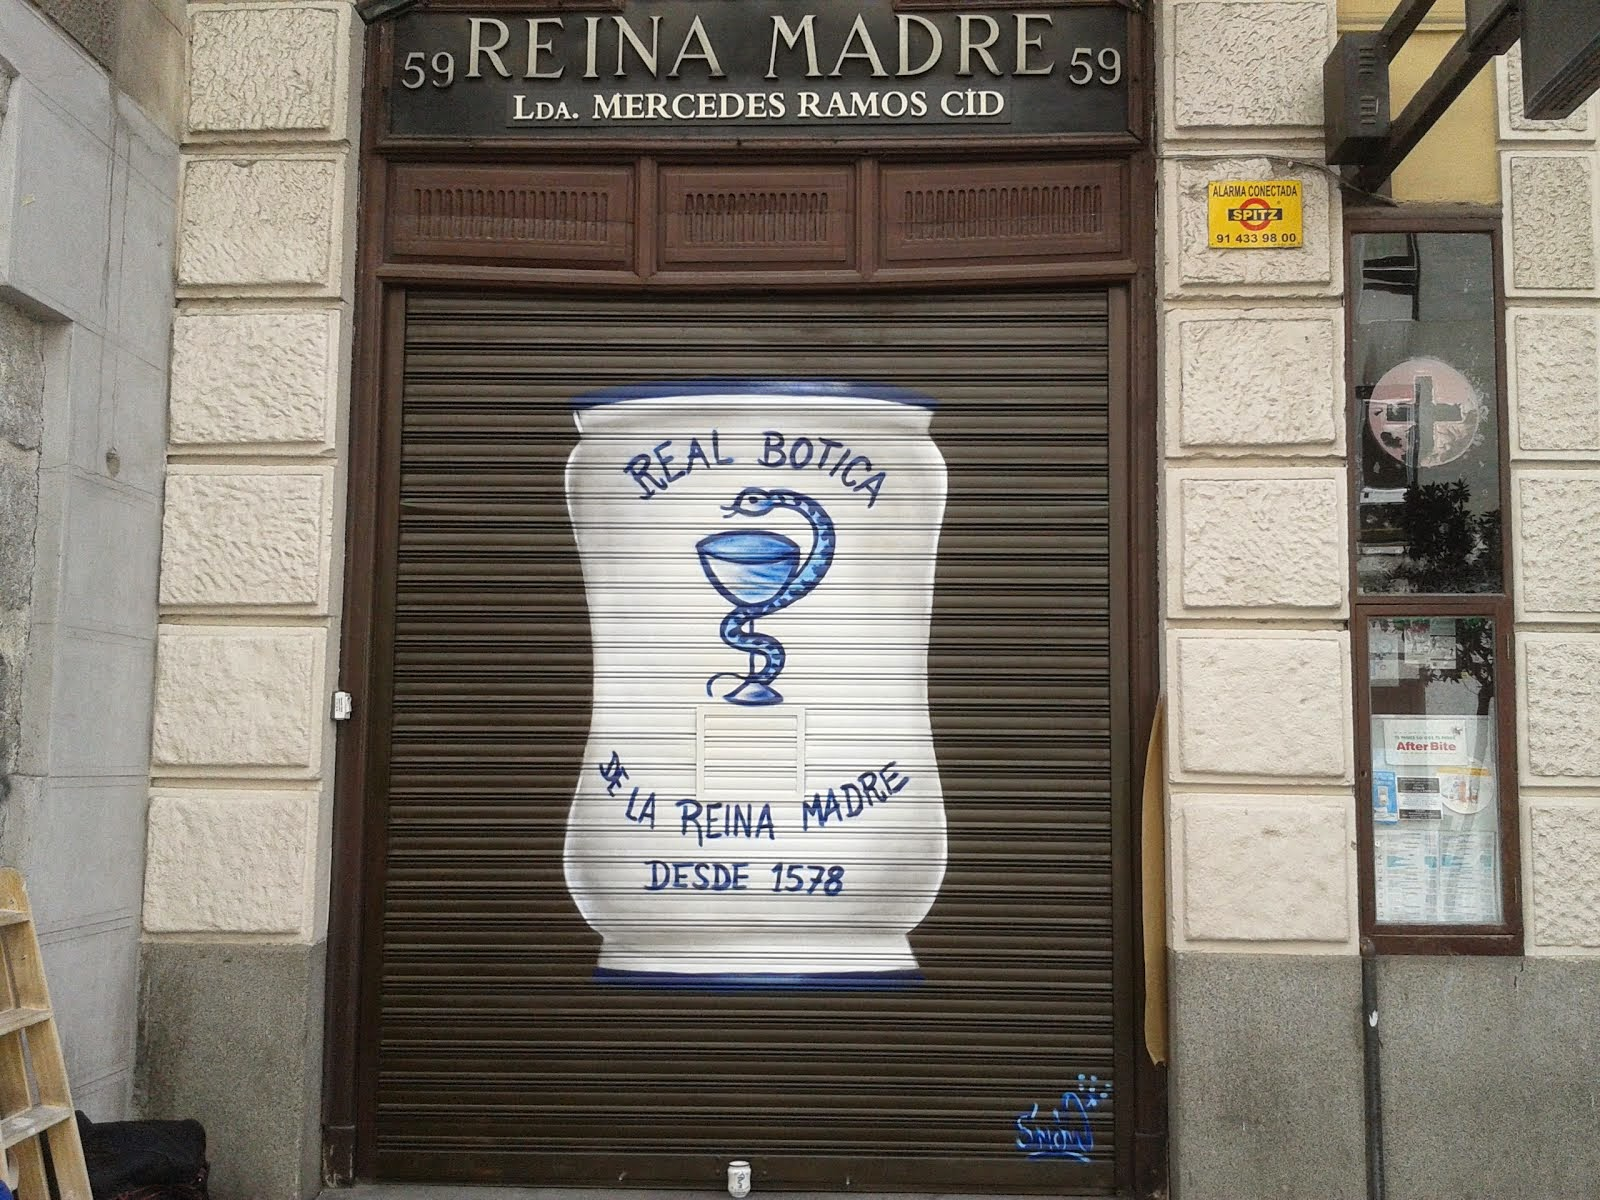 cierre farmacia mas antigua de madrid